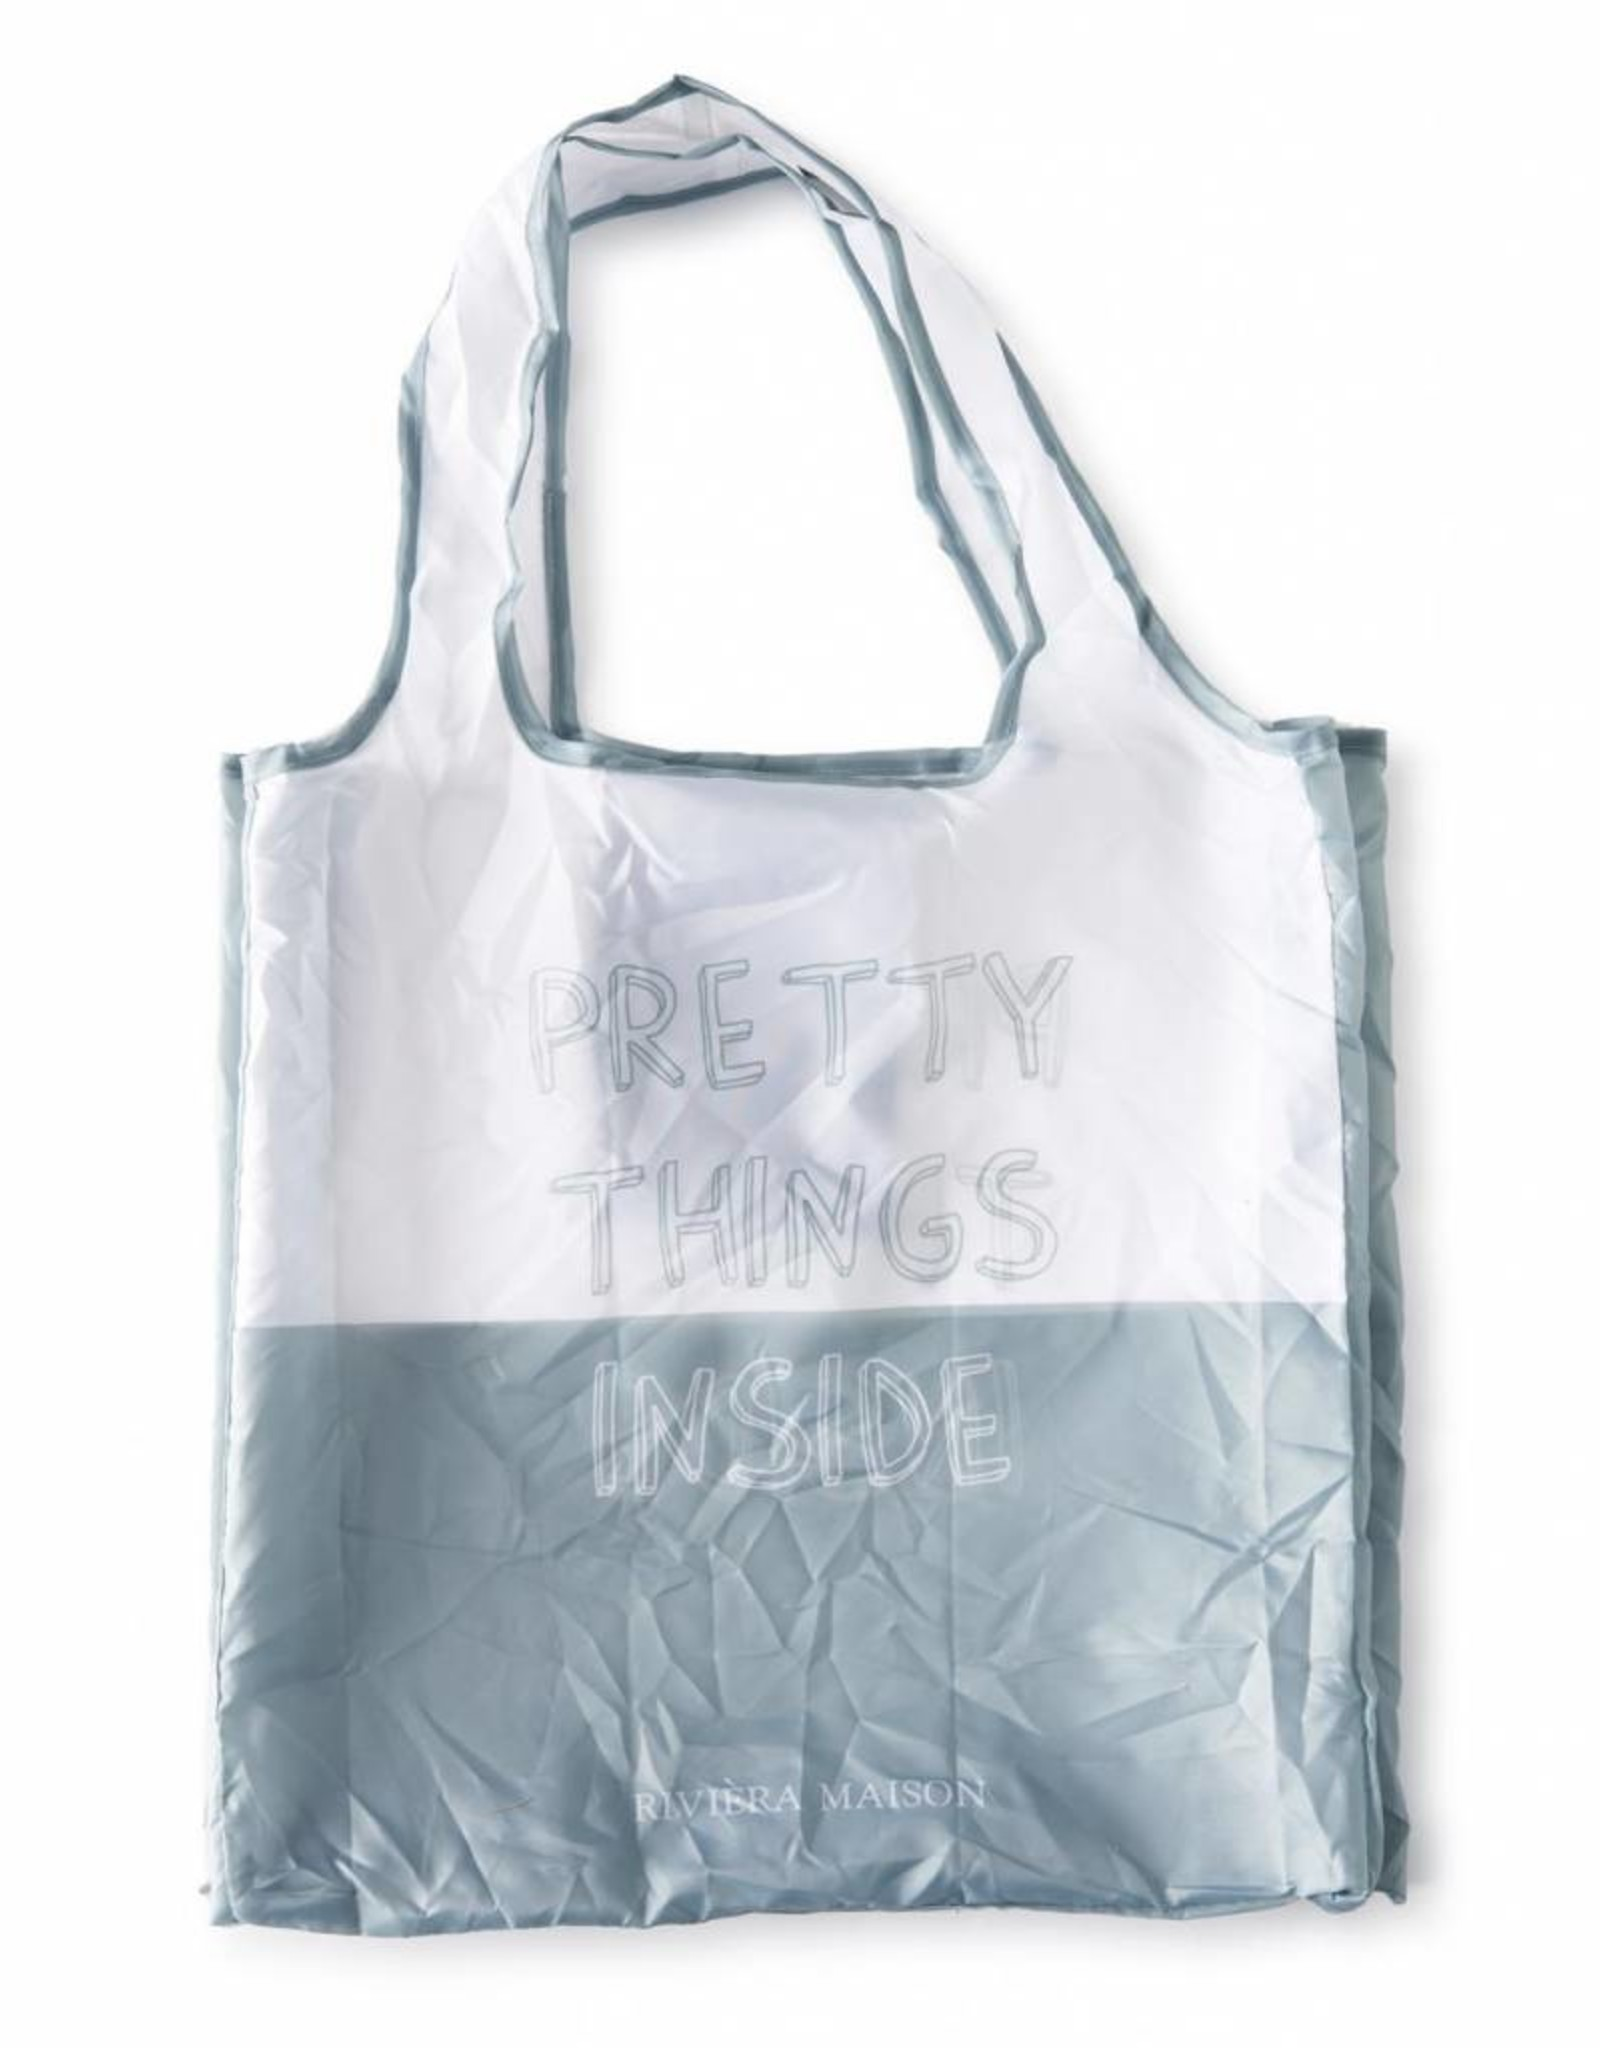 Riviera Maison Pretty things inside bag